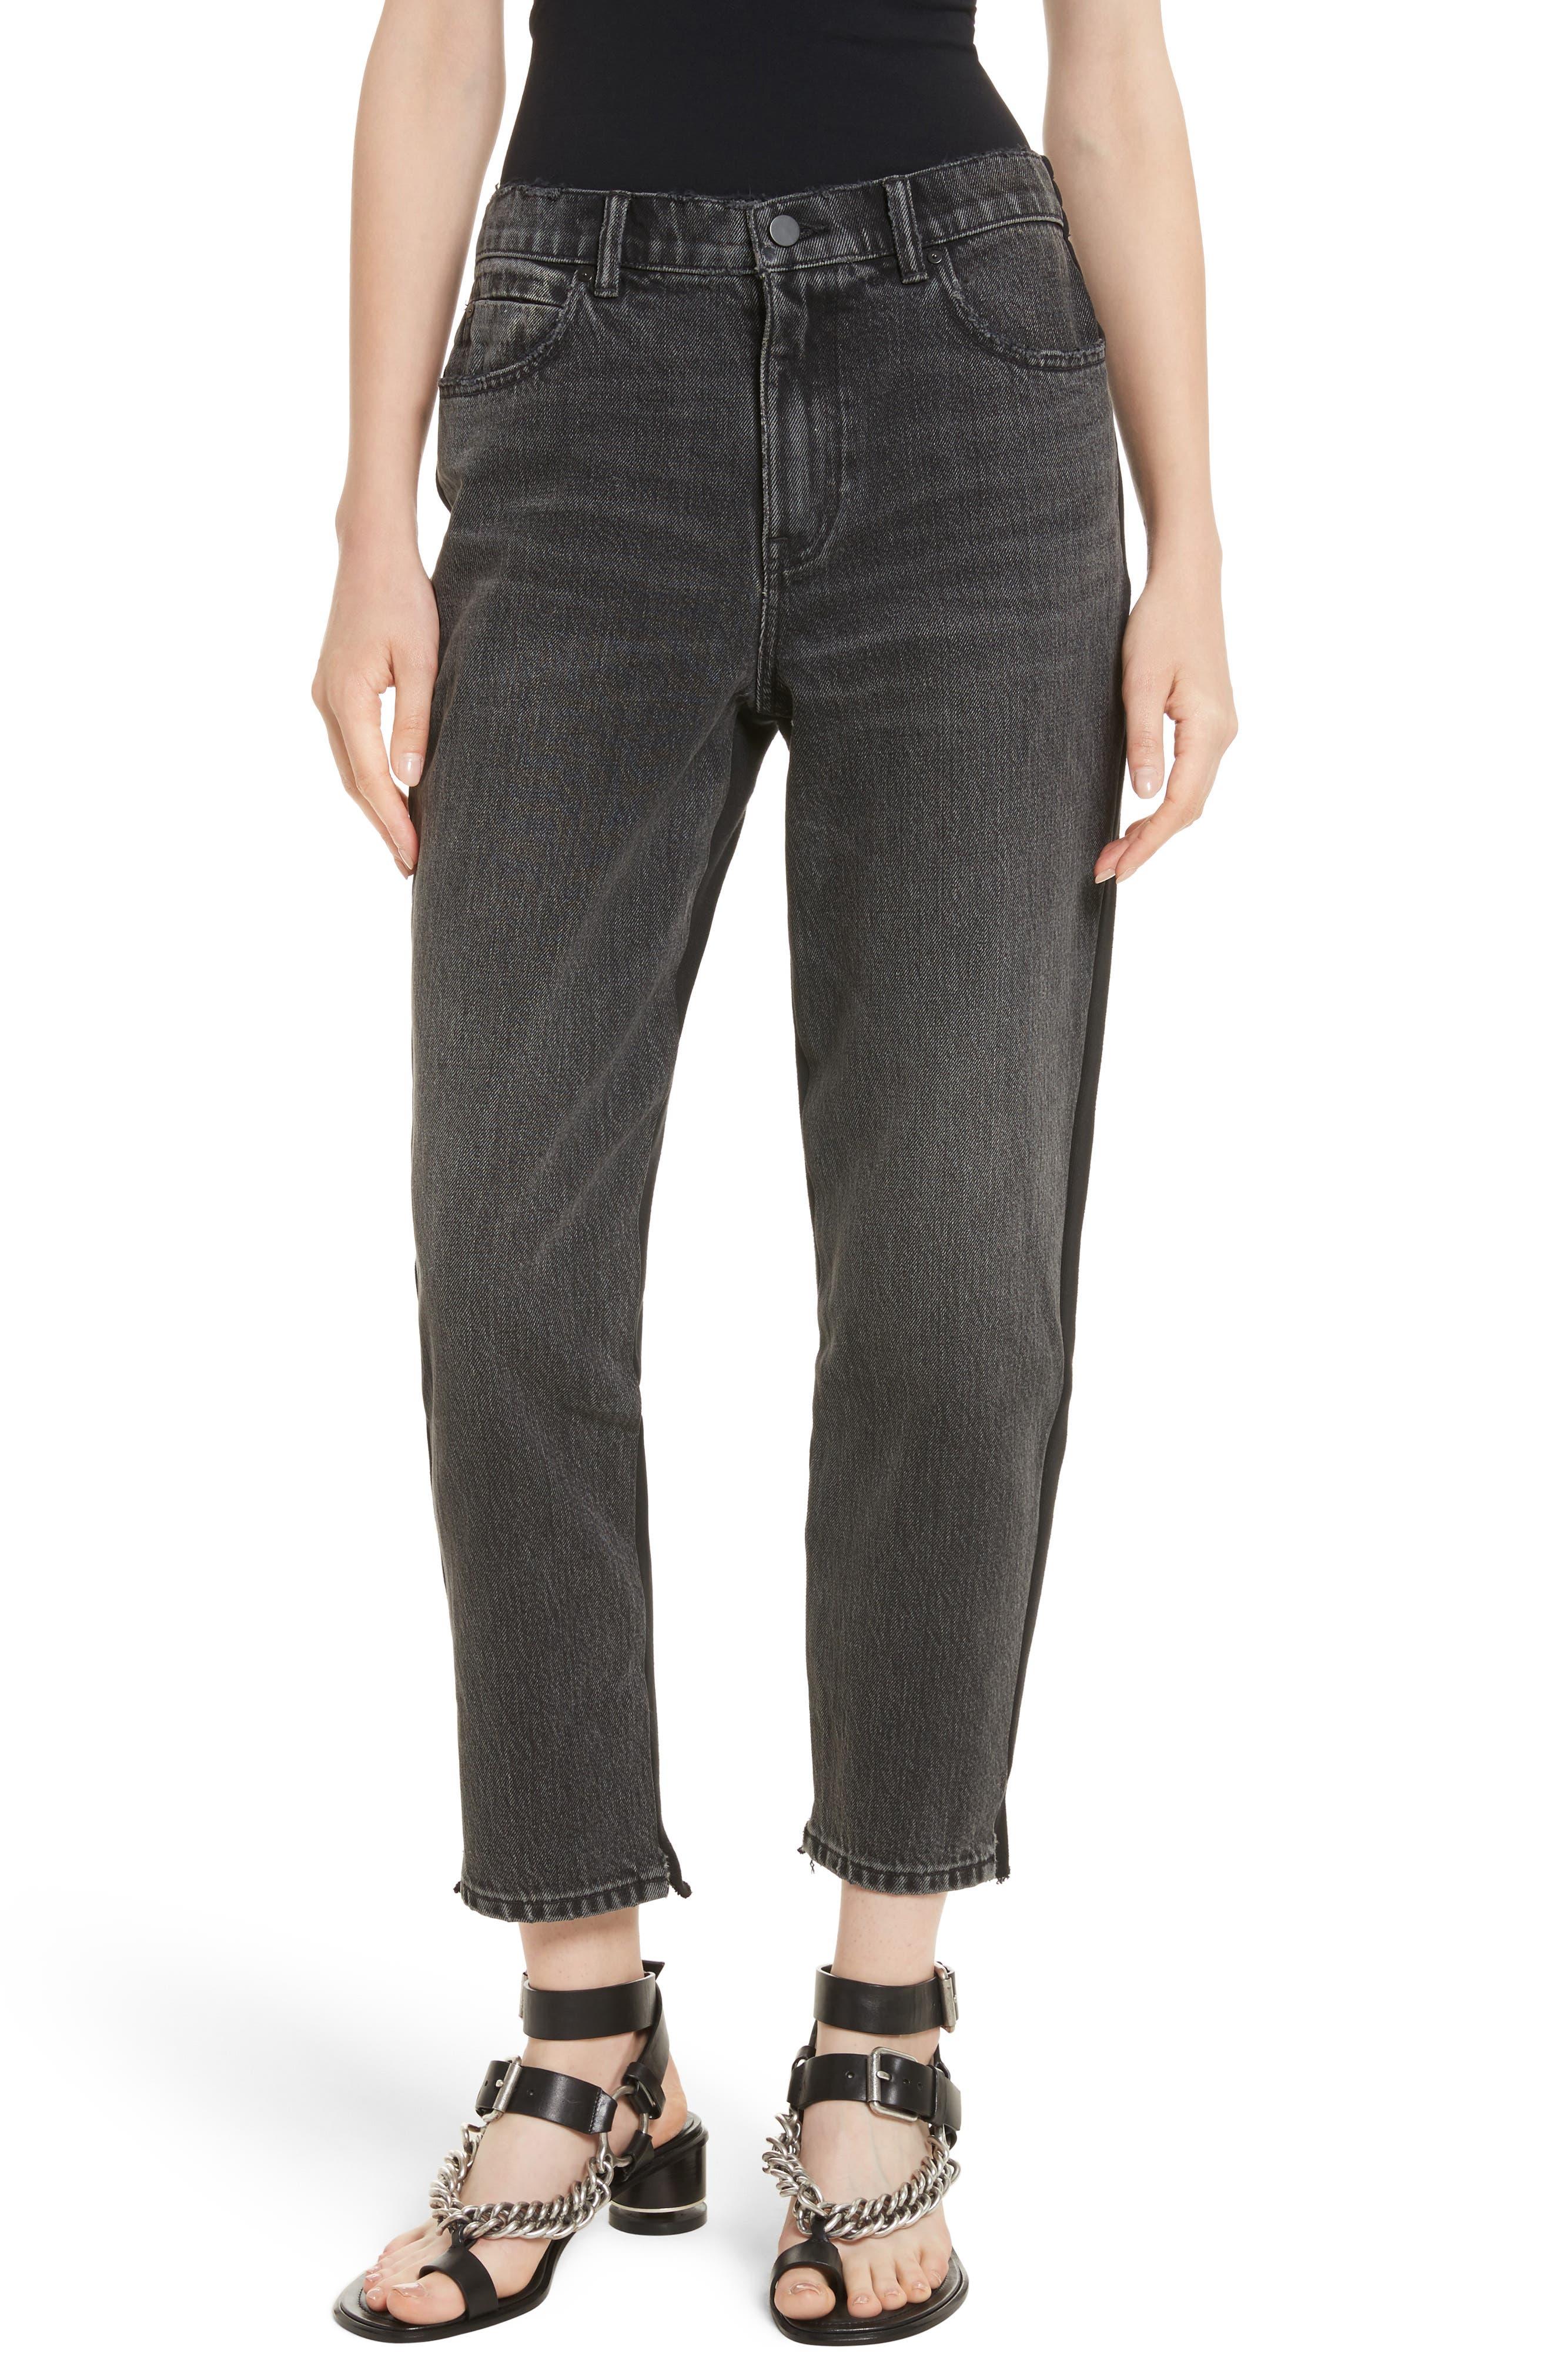 Denim x Alexander Wang Hybrid Sweatpants Jeans,                         Main,                         color, Grey Aged